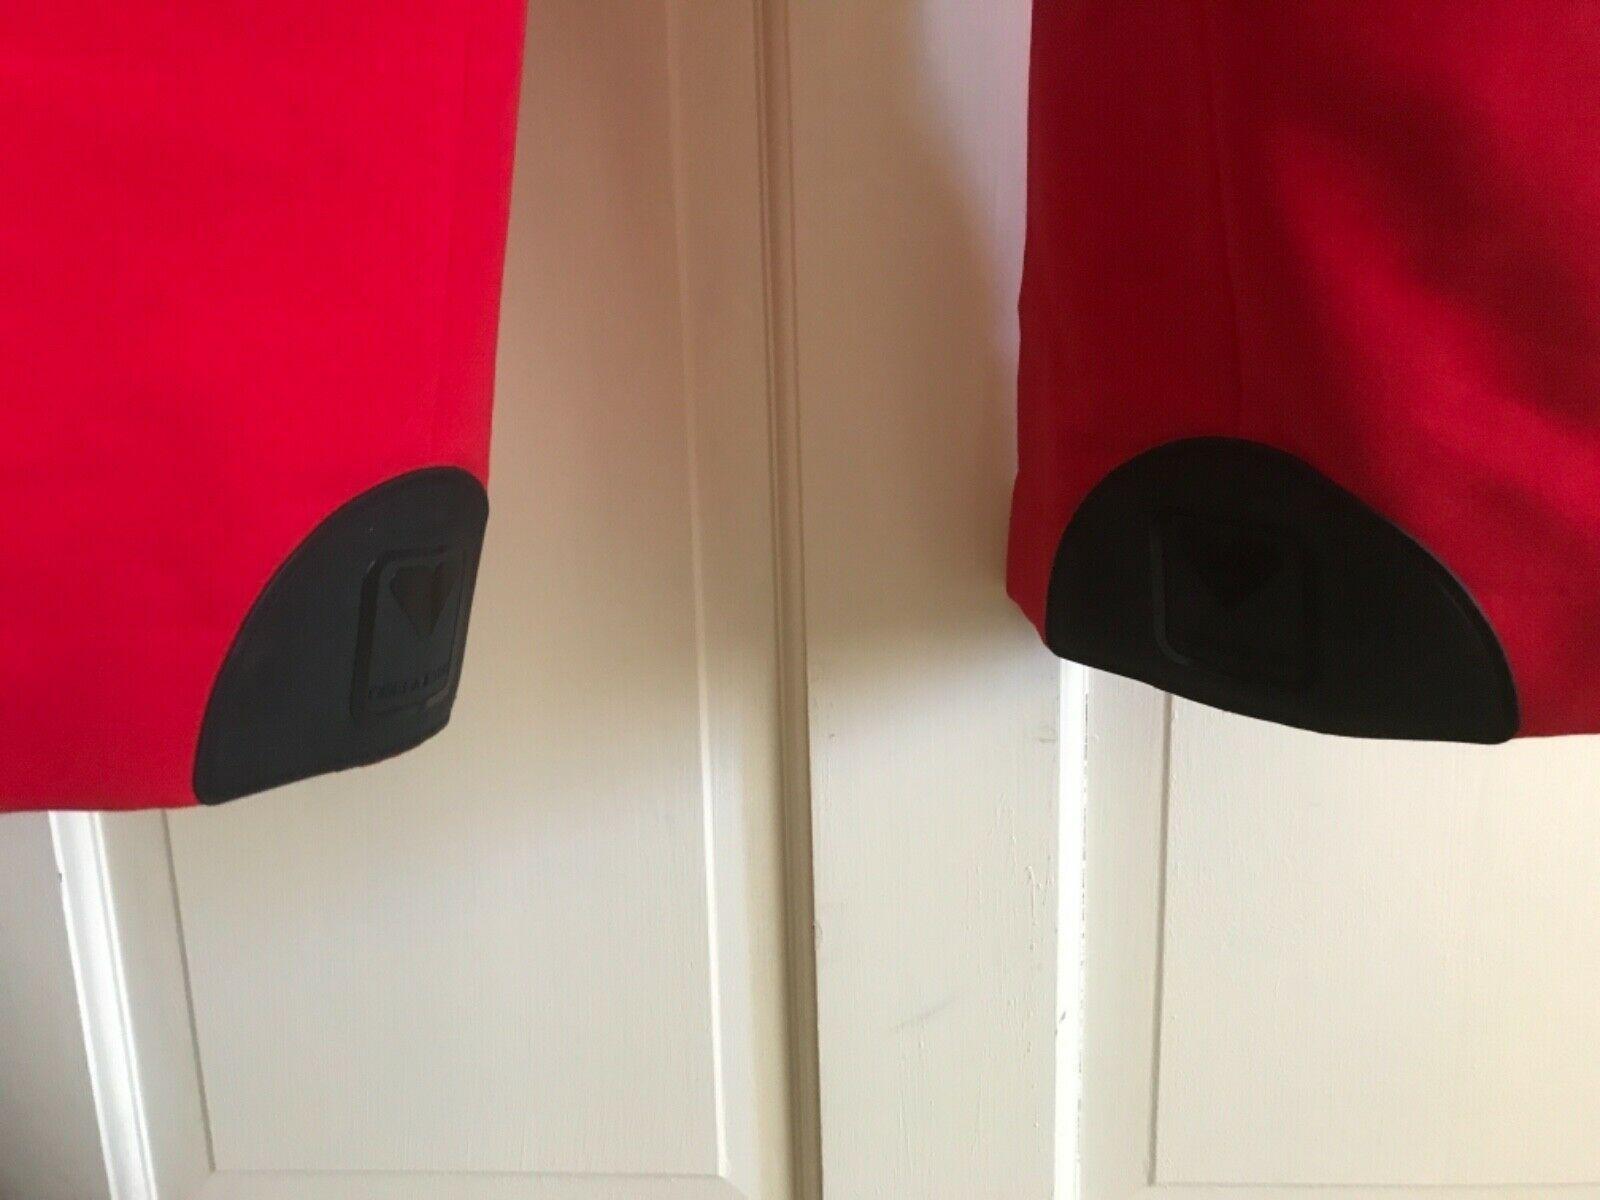 WOMENS Vtg OBERMEYER Red Wool Nylon Stretch Ski Bibs Pants Japan LK NW! EEUC XS image 5